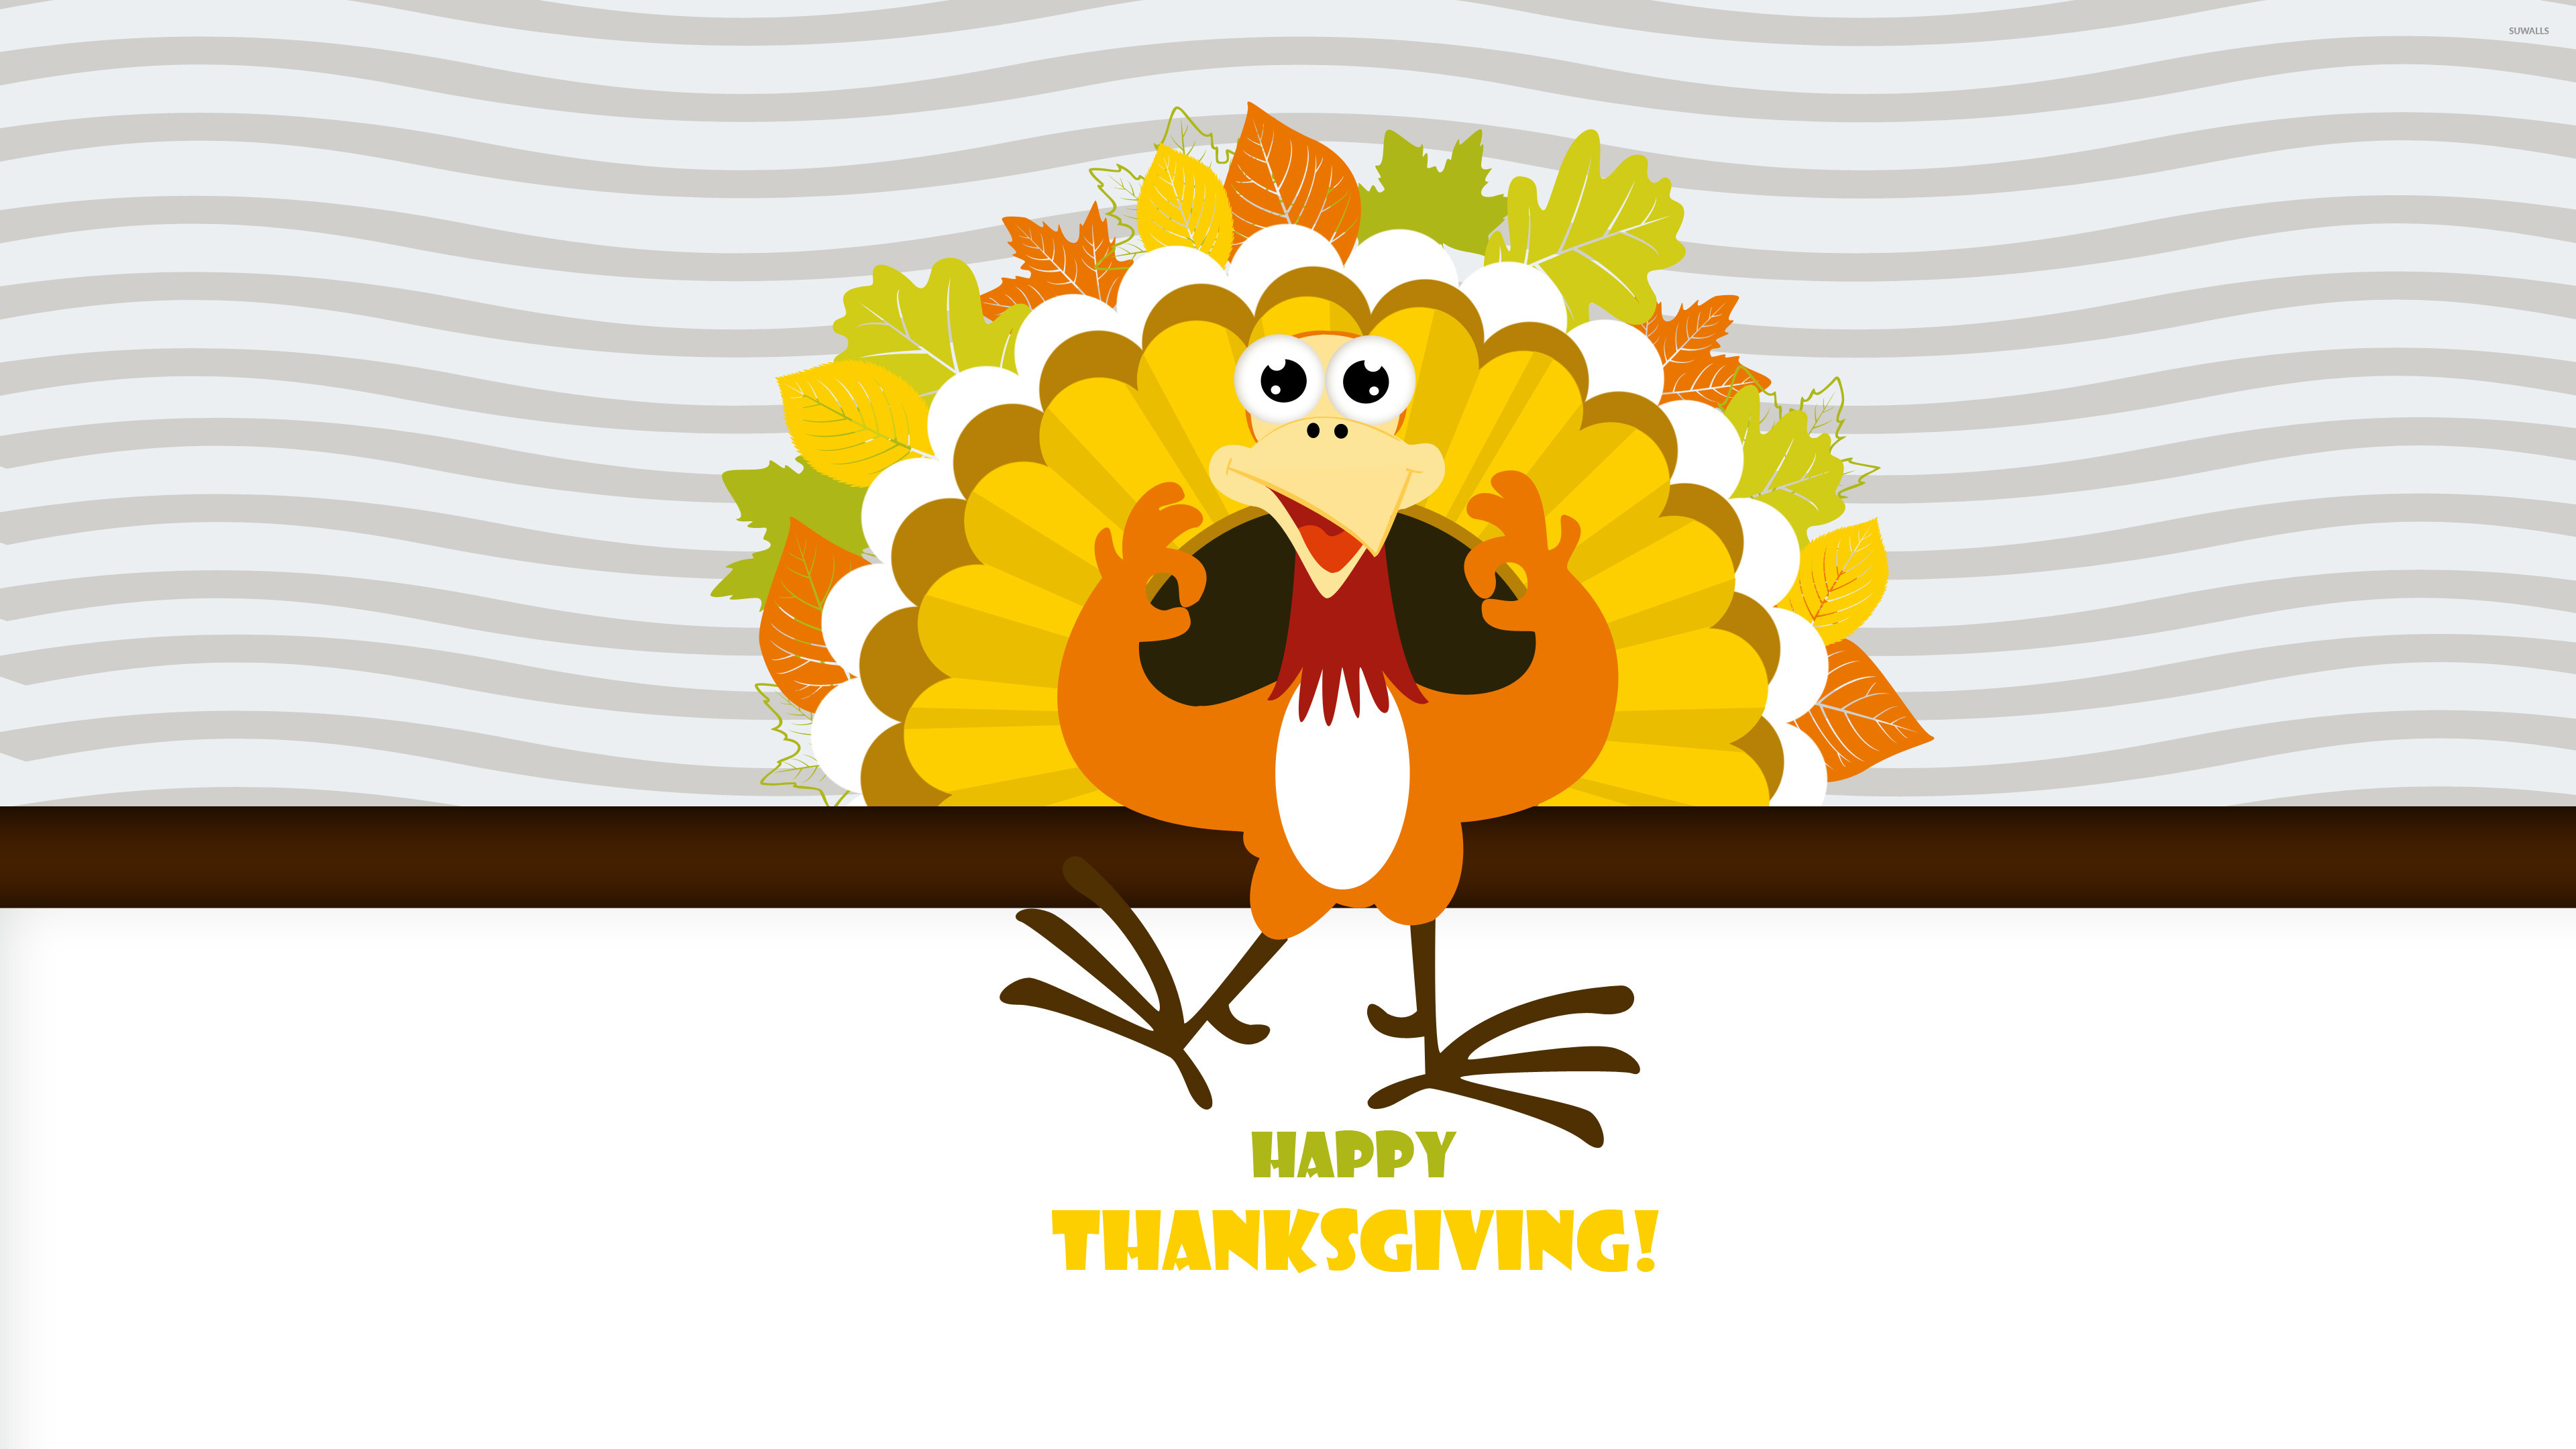 Autumn Leaves Falling Hd Wallpaper Turkey Wallpaper Thanksgiving 183 ① Wallpapertag